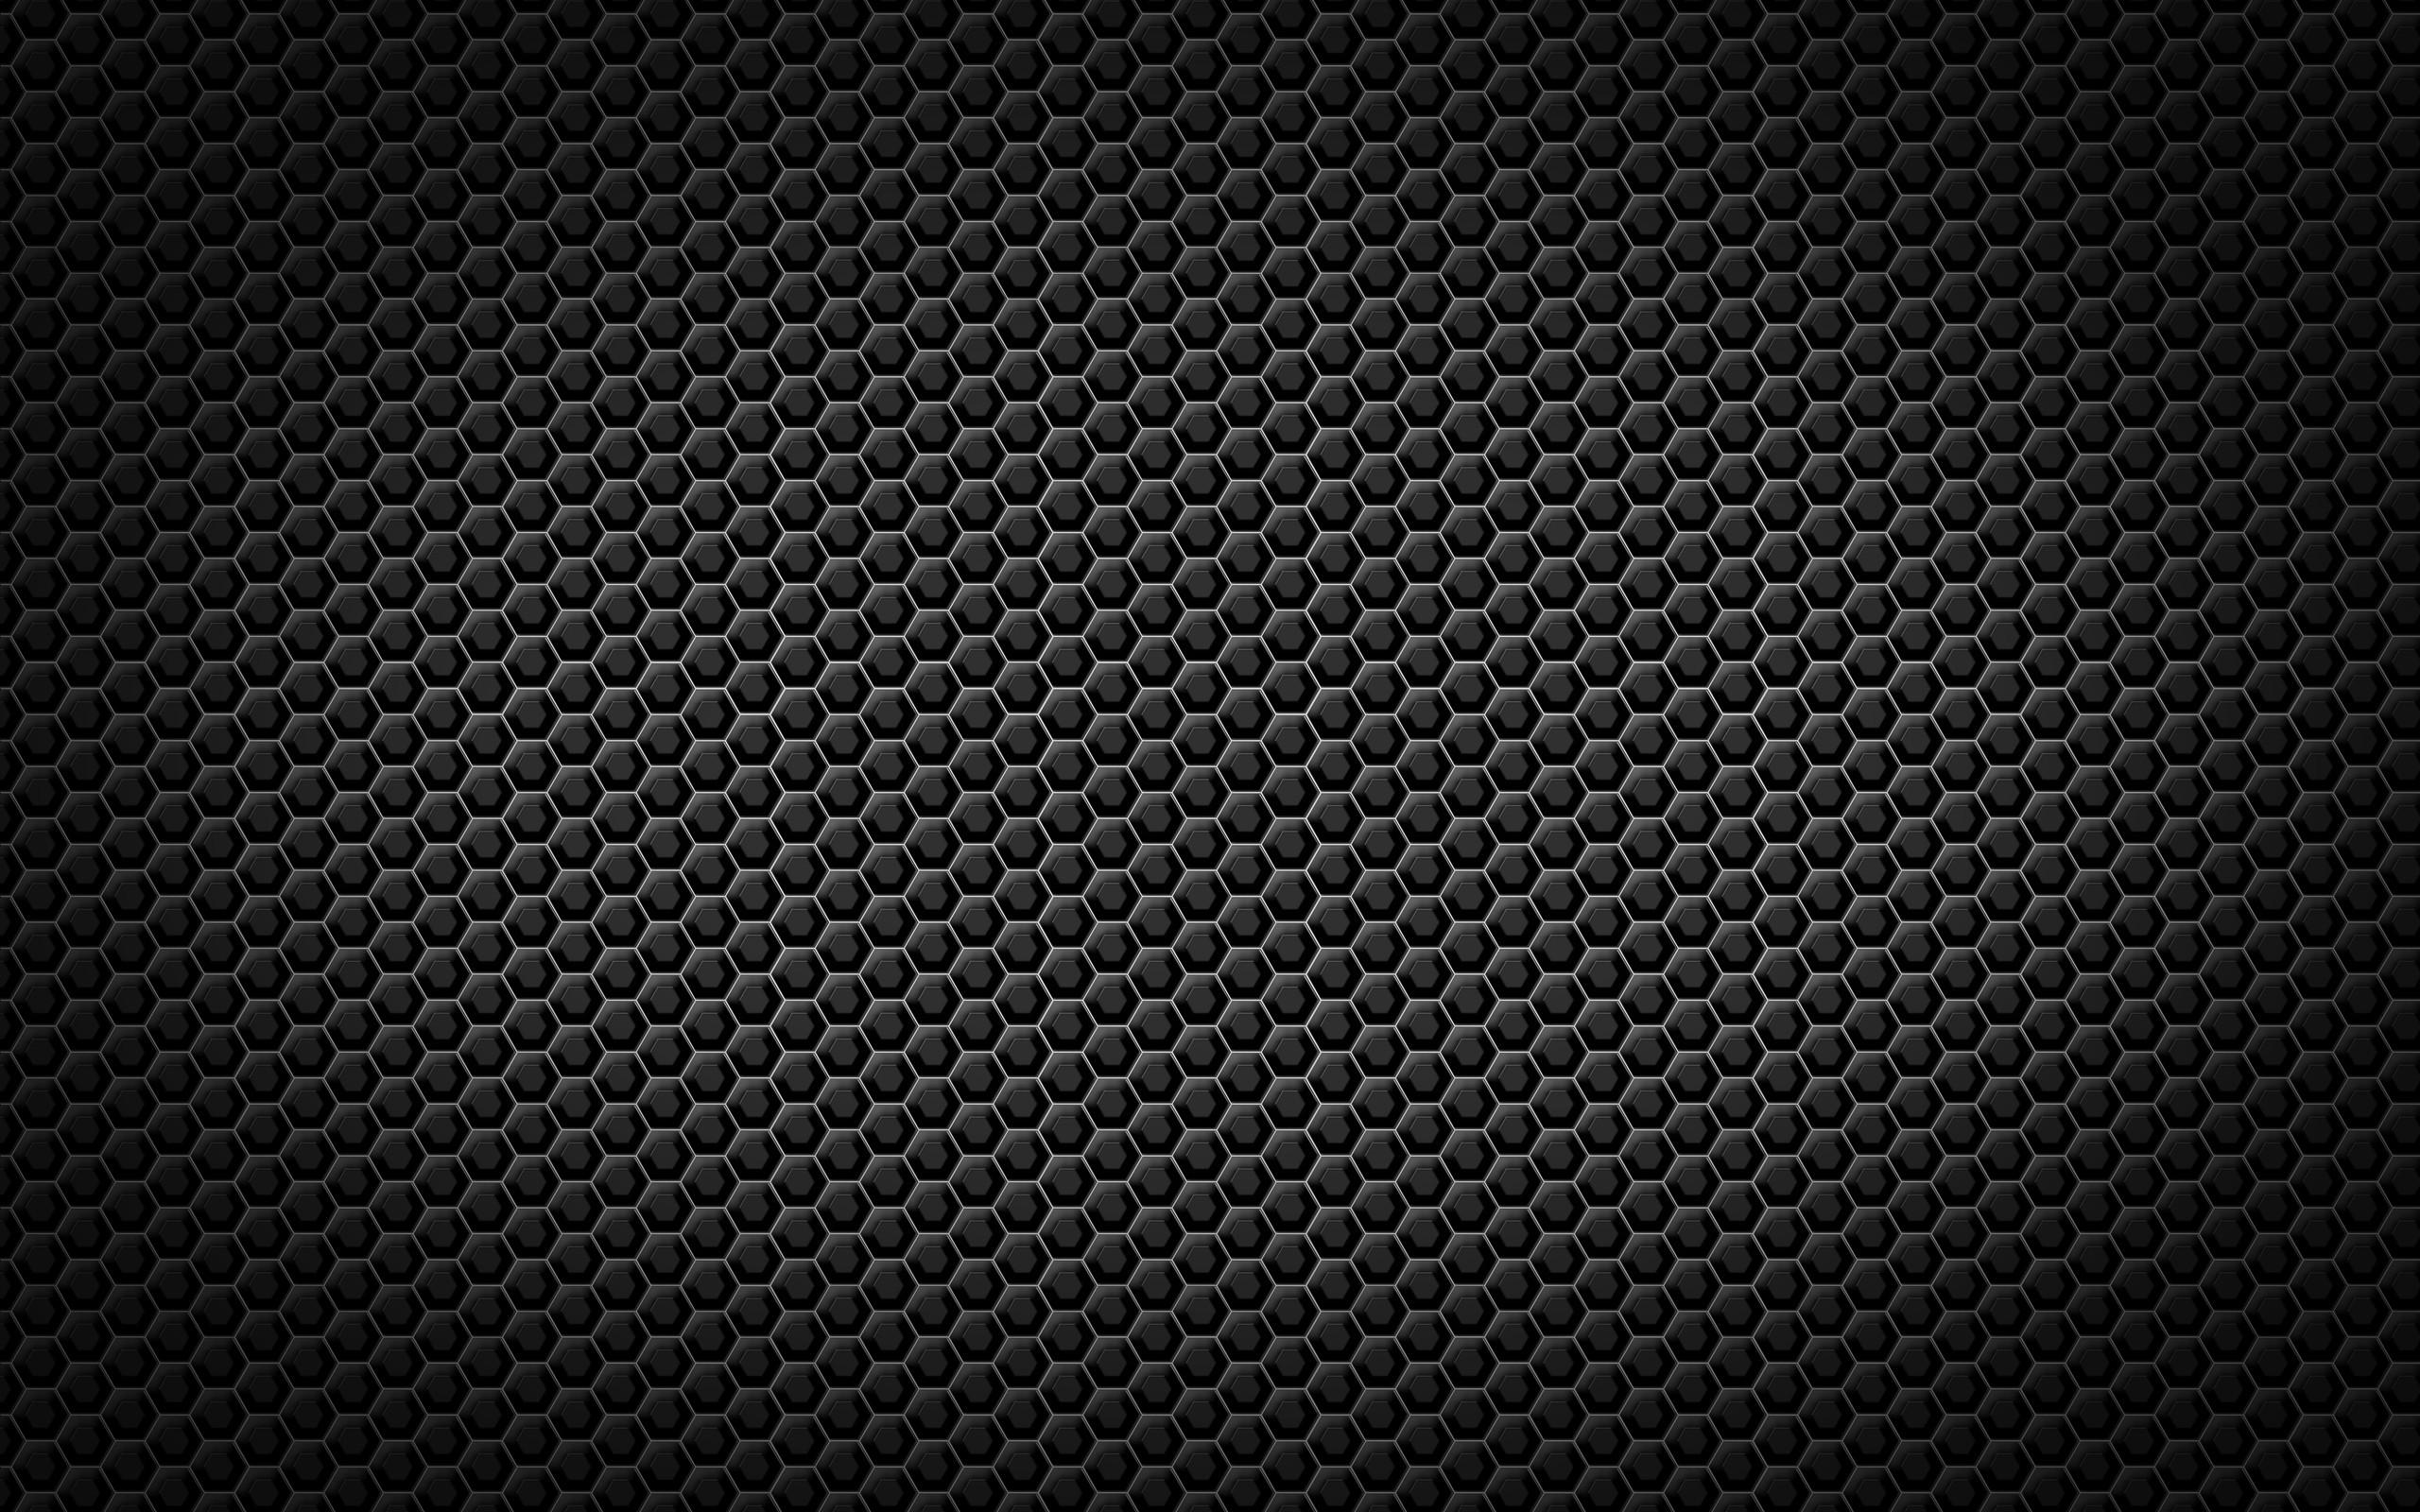 Striped Hd Black Grey Pattern Hd Wallpapers | Wallpaper | Pinterest | Grey  pattern, Hd wallpaper and Wallpaper